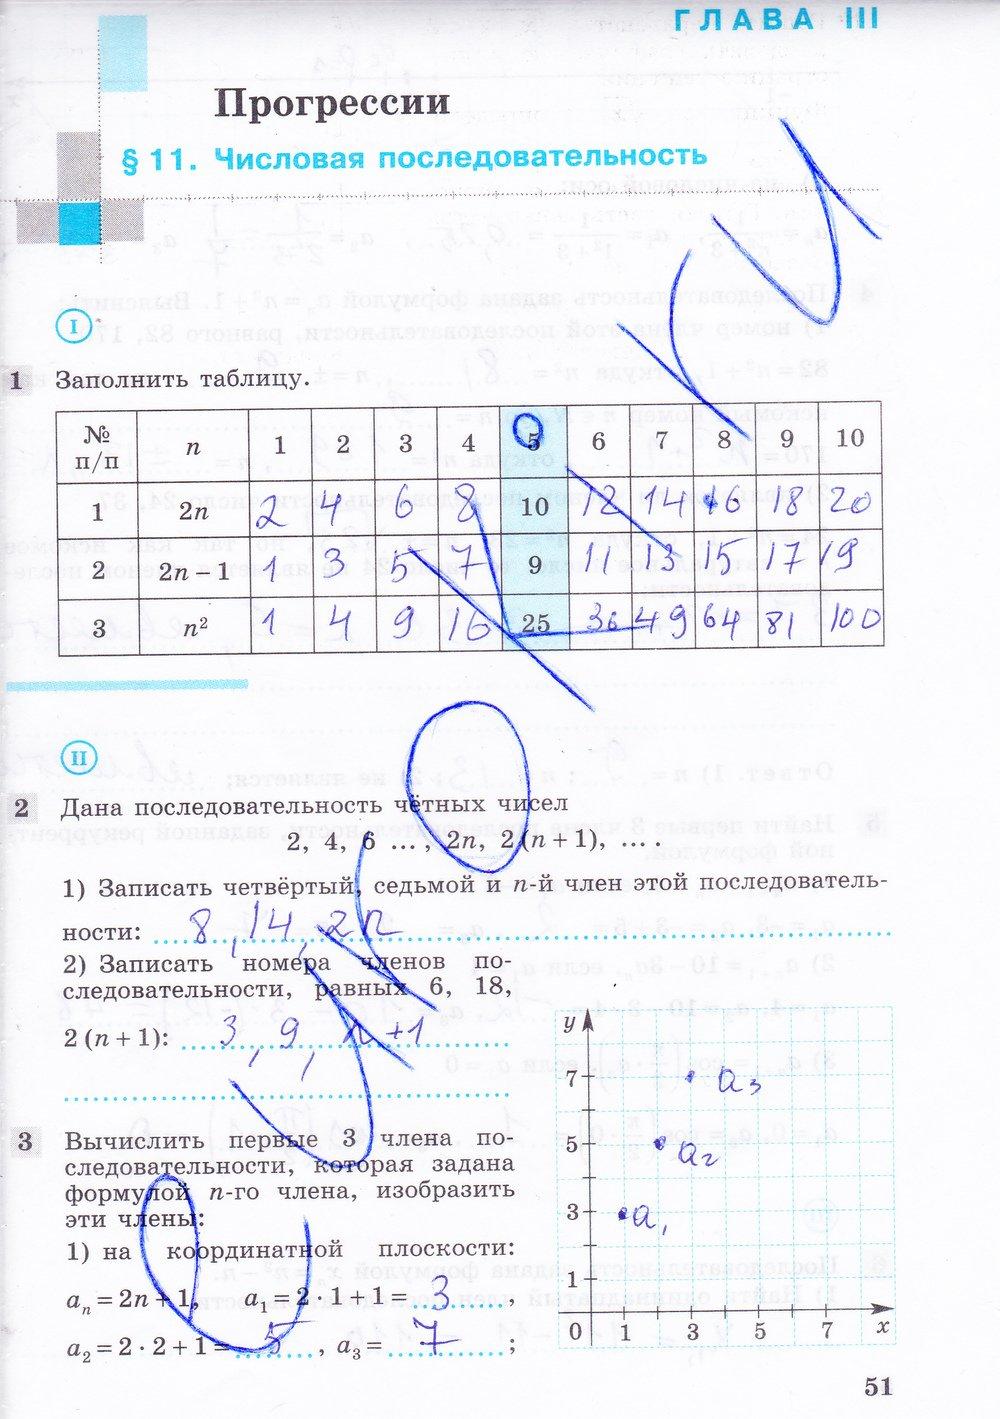 гдз по математике 7 класс автор колягин